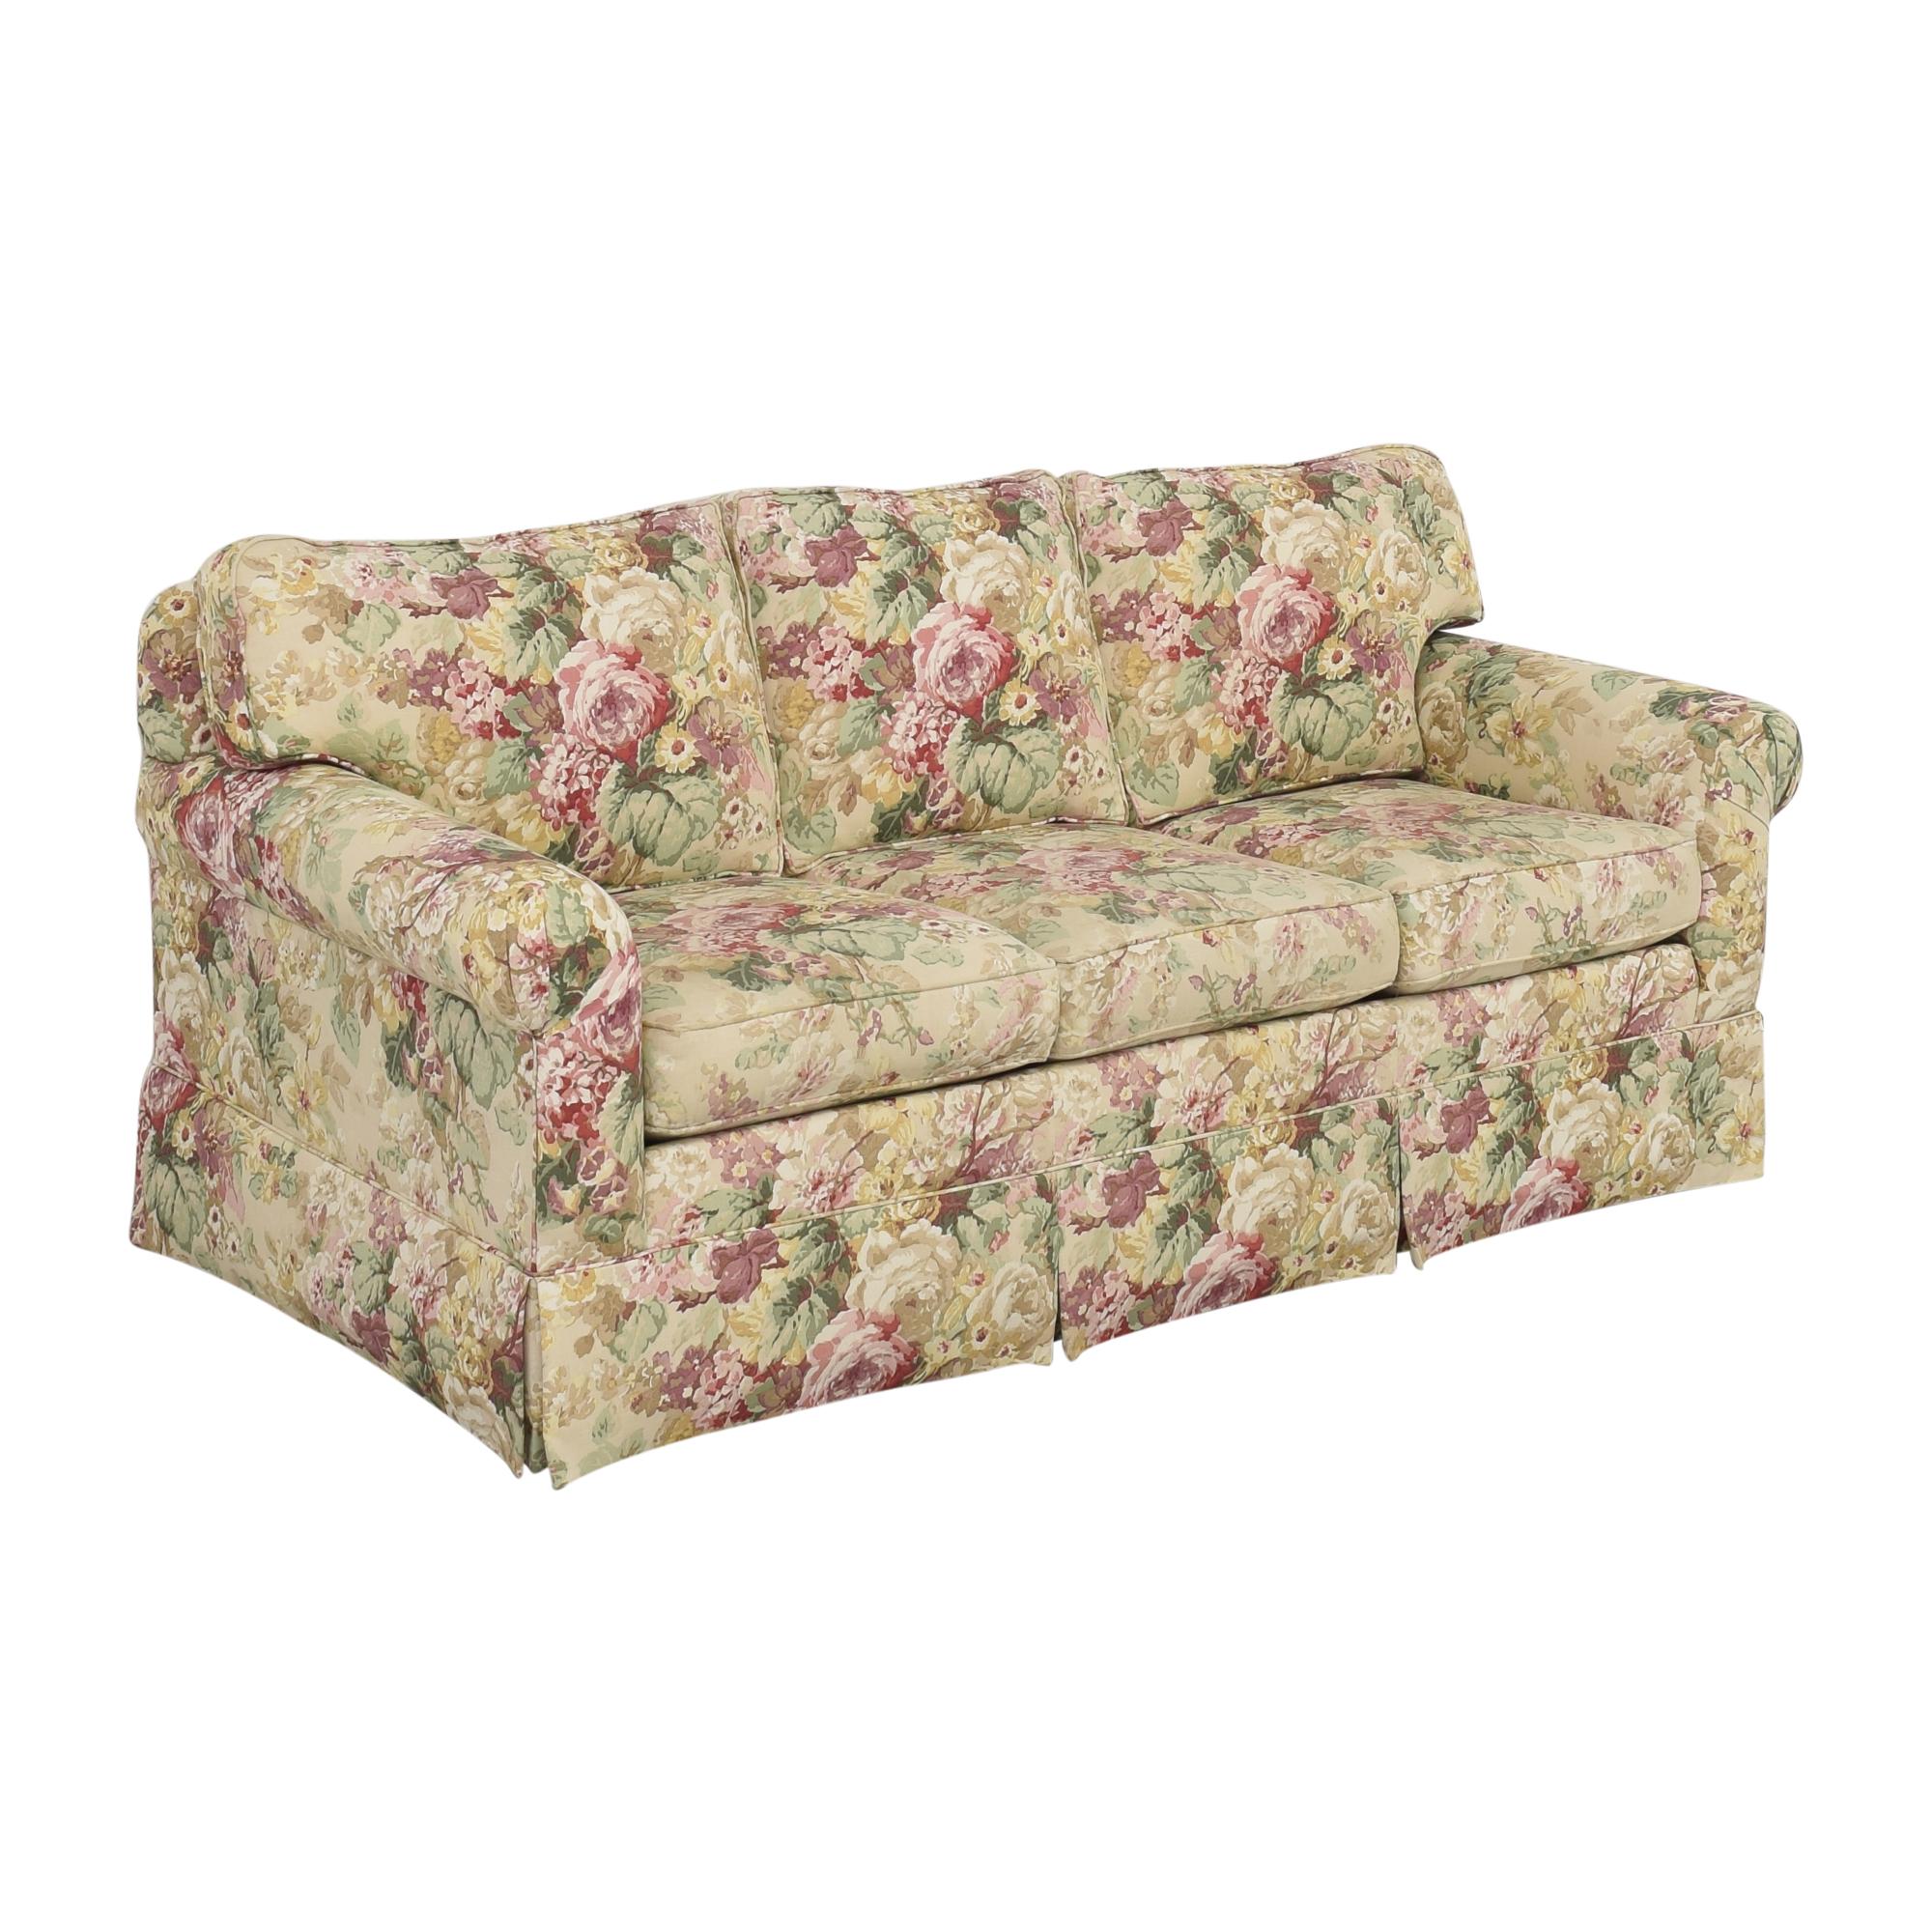 Ethan Allen Ethan Allen Floral Three Cushion Sofa for sale